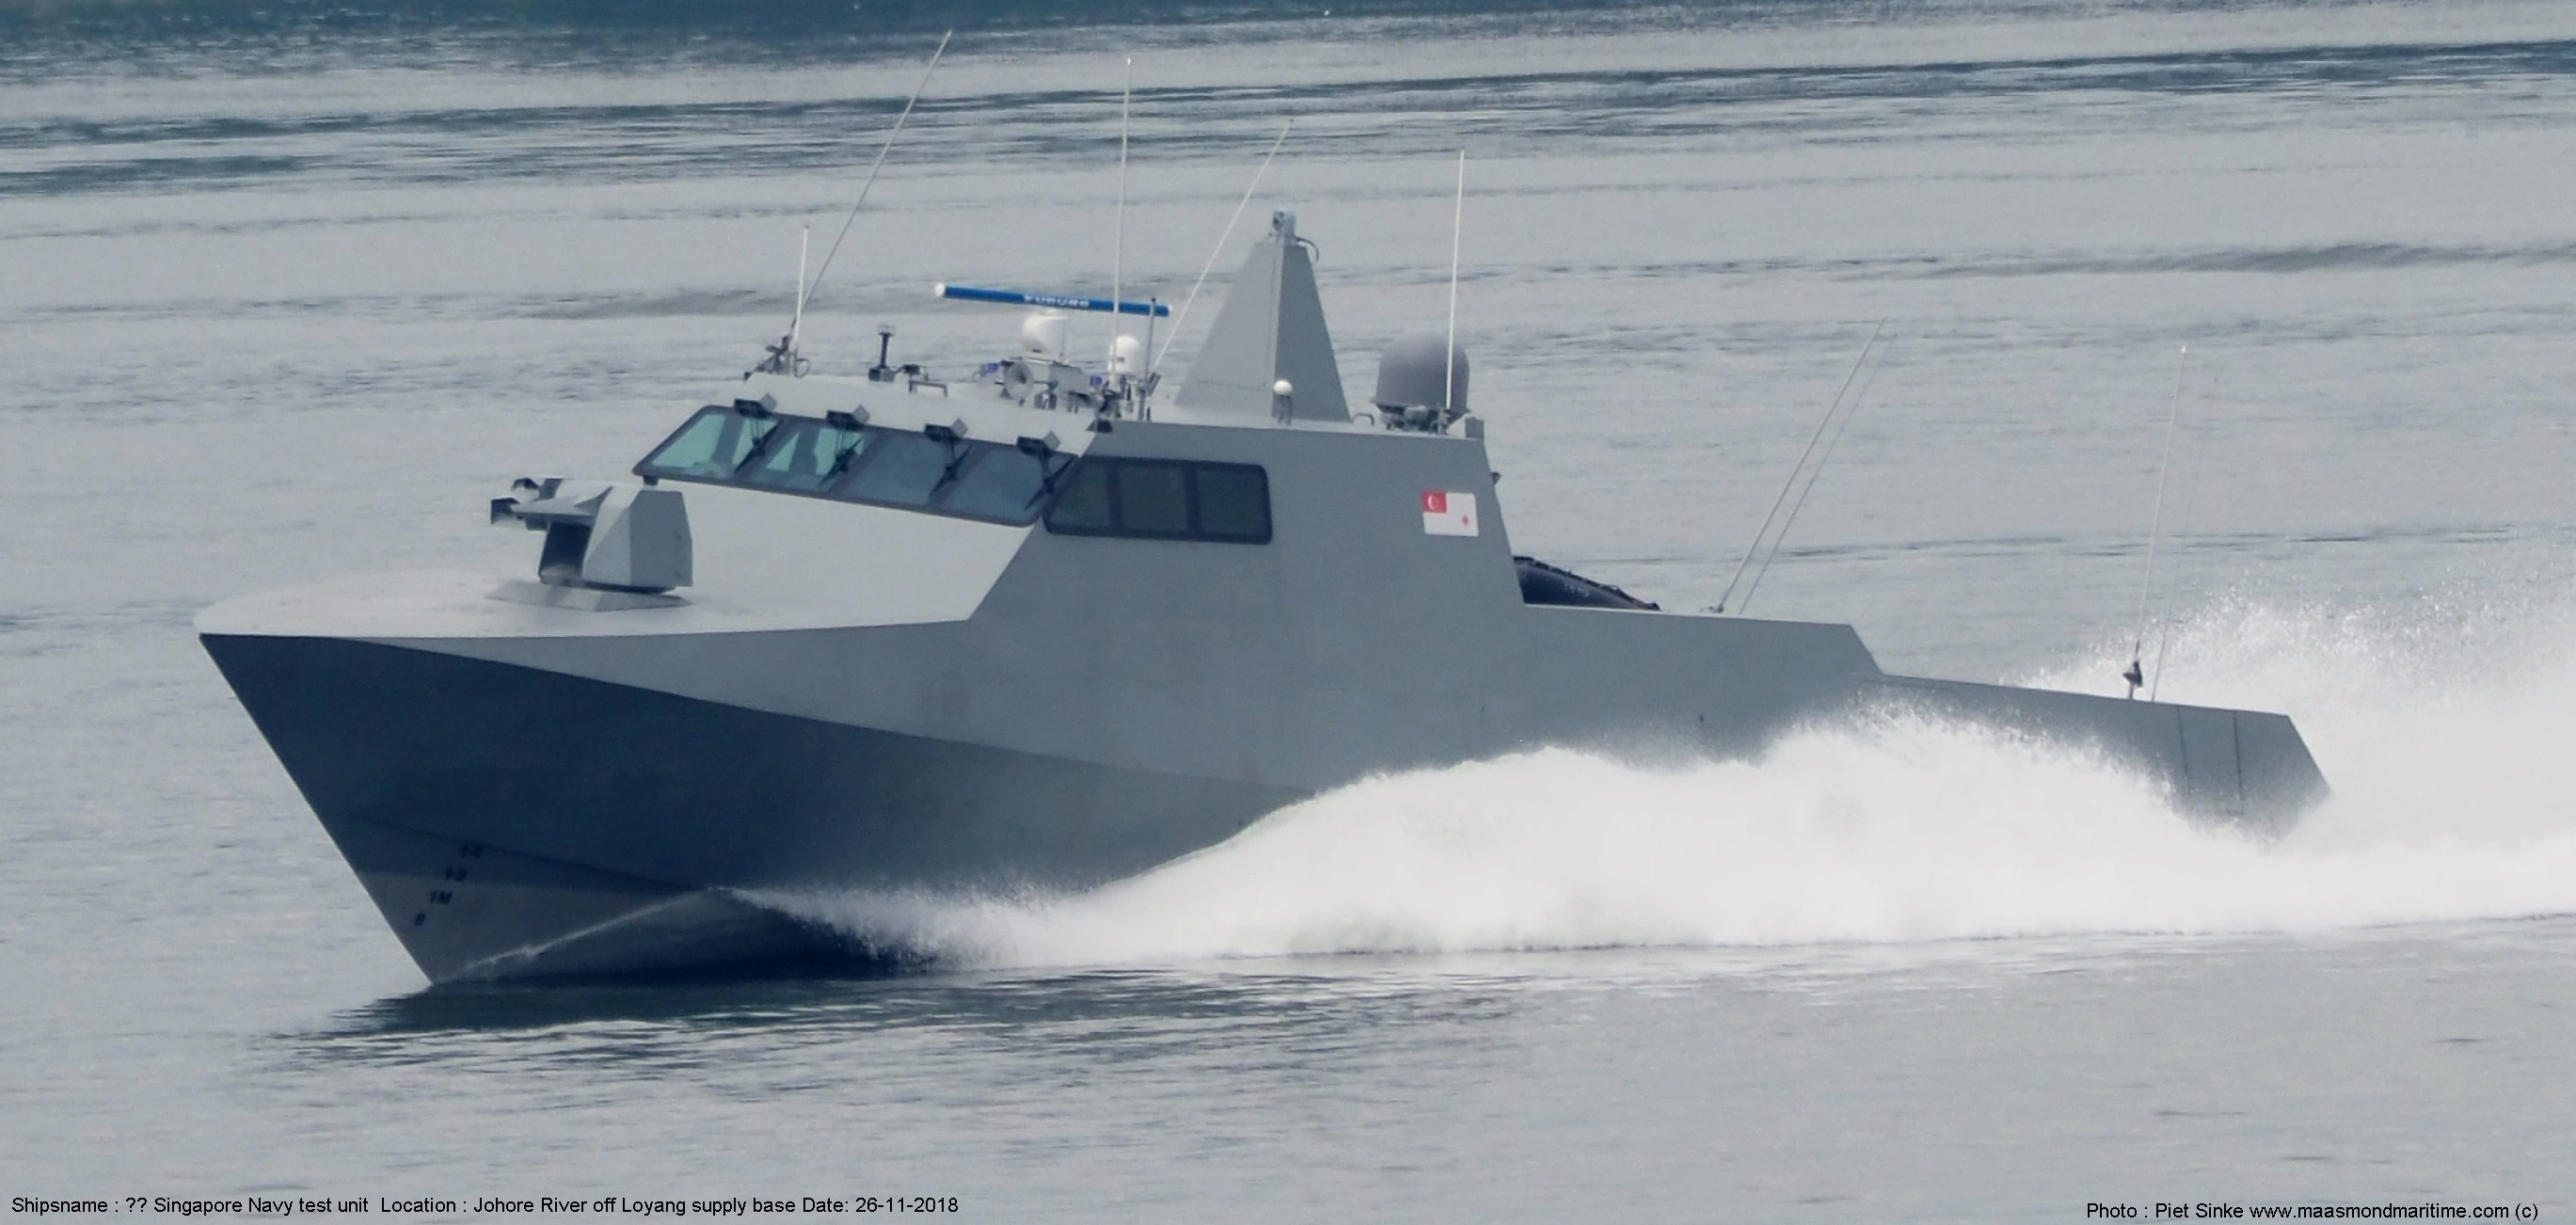 Singapore Navy - Marine de Singapour - Page 2 31161995737_13a07a1c1f_o